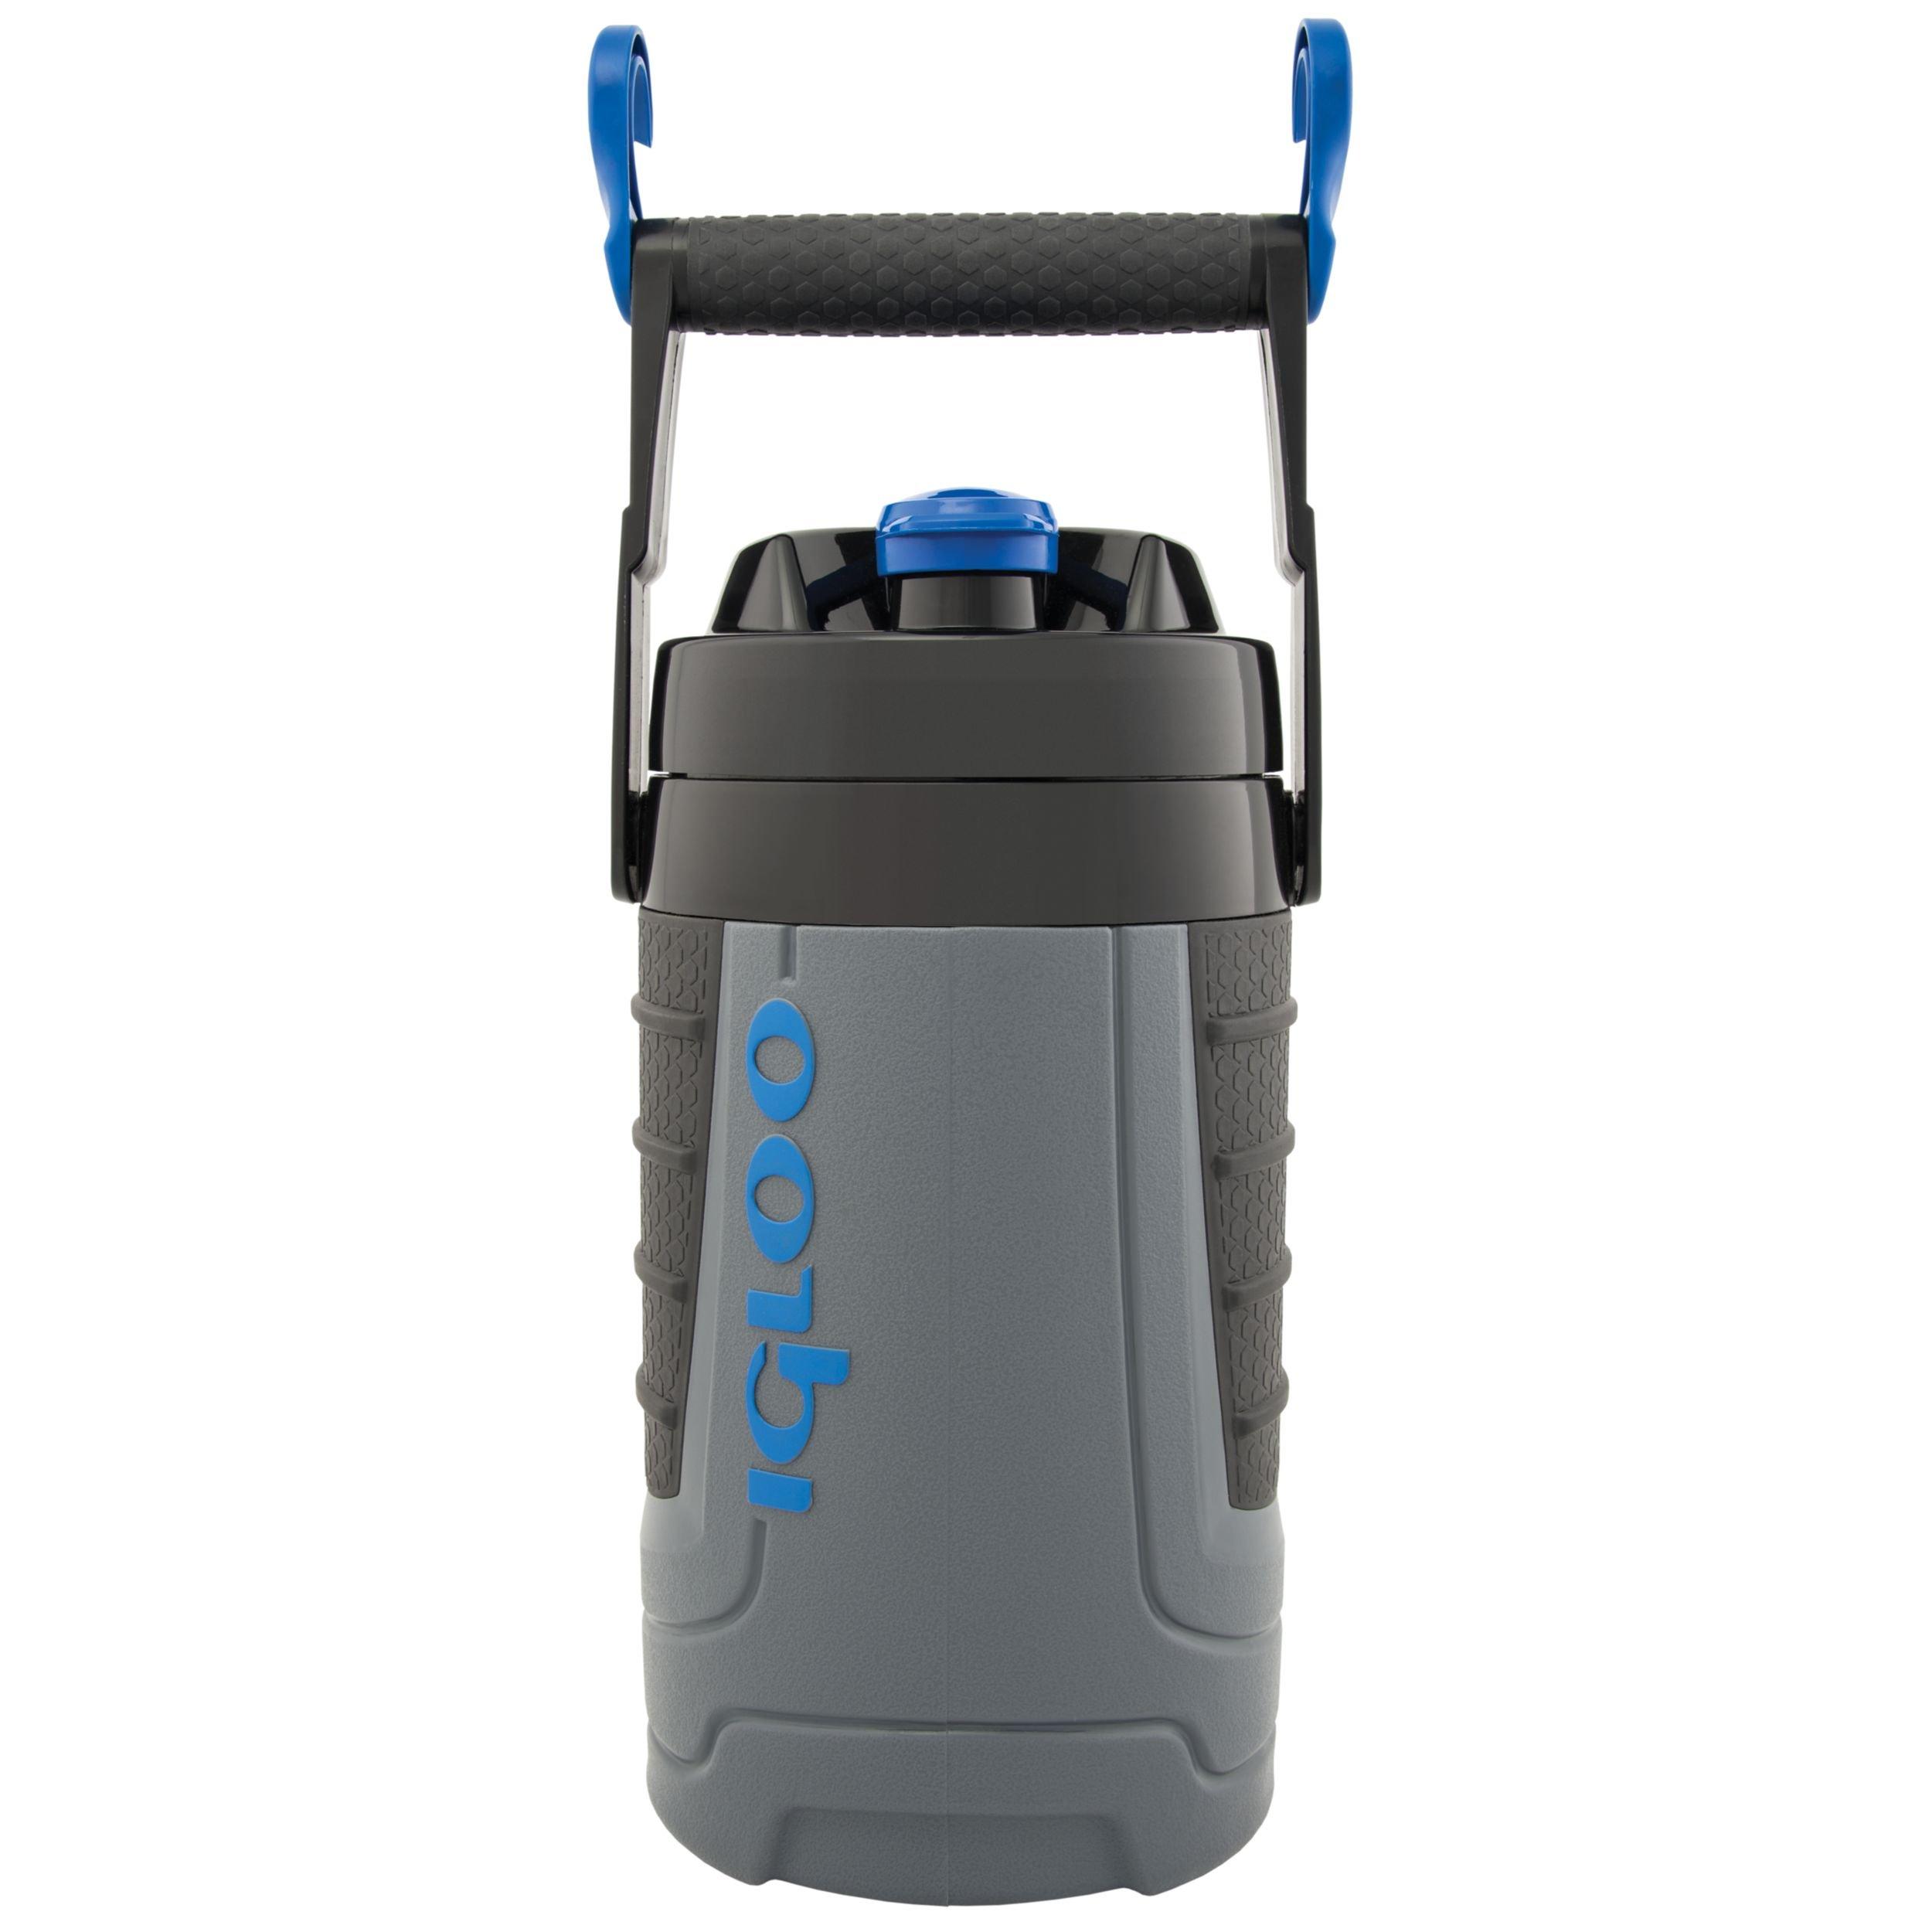 Igloo Proformance(Tm) 1/2 Gallon Insulated Sports Jug, Gray/Black/Black/Royal Blue, 64 Oz.